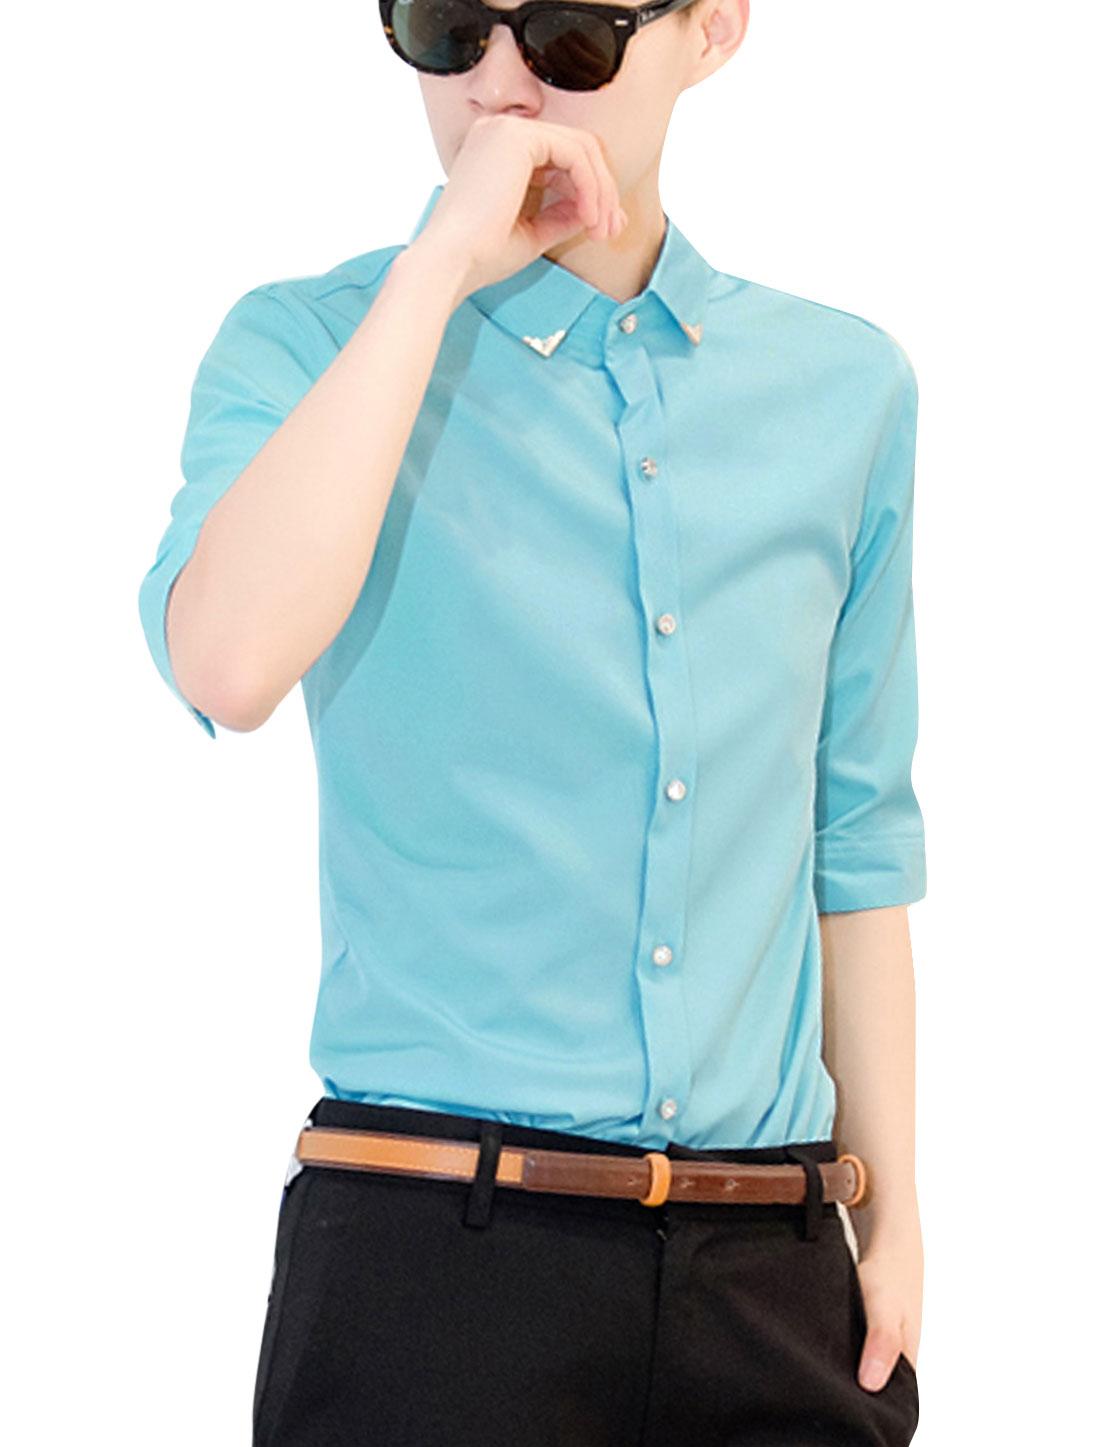 Men Point Collar Elbow Sleeve Button Up Round Hem Shirt Sky Blue S